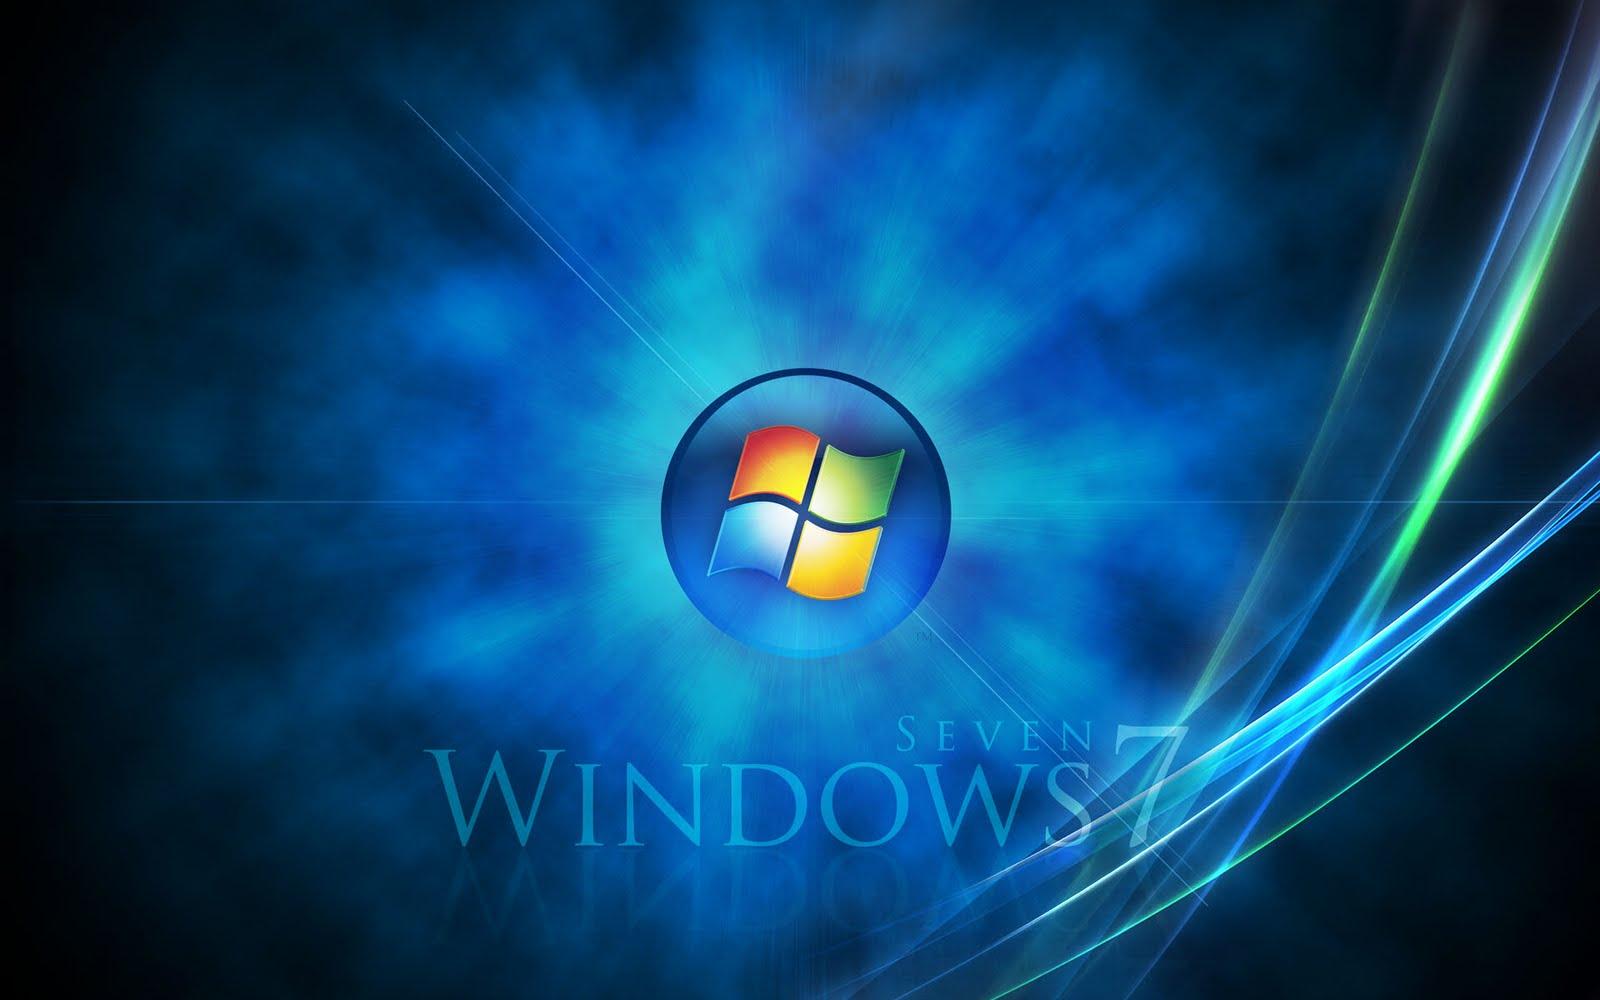 http://2.bp.blogspot.com/_Qc6aMdLT994/S6pU4OOt9EI/AAAAAAAAFGc/gynDp4qc4PI/s1600/Windows+7+ultimate+collection+of+wallpapers+(5).jpg